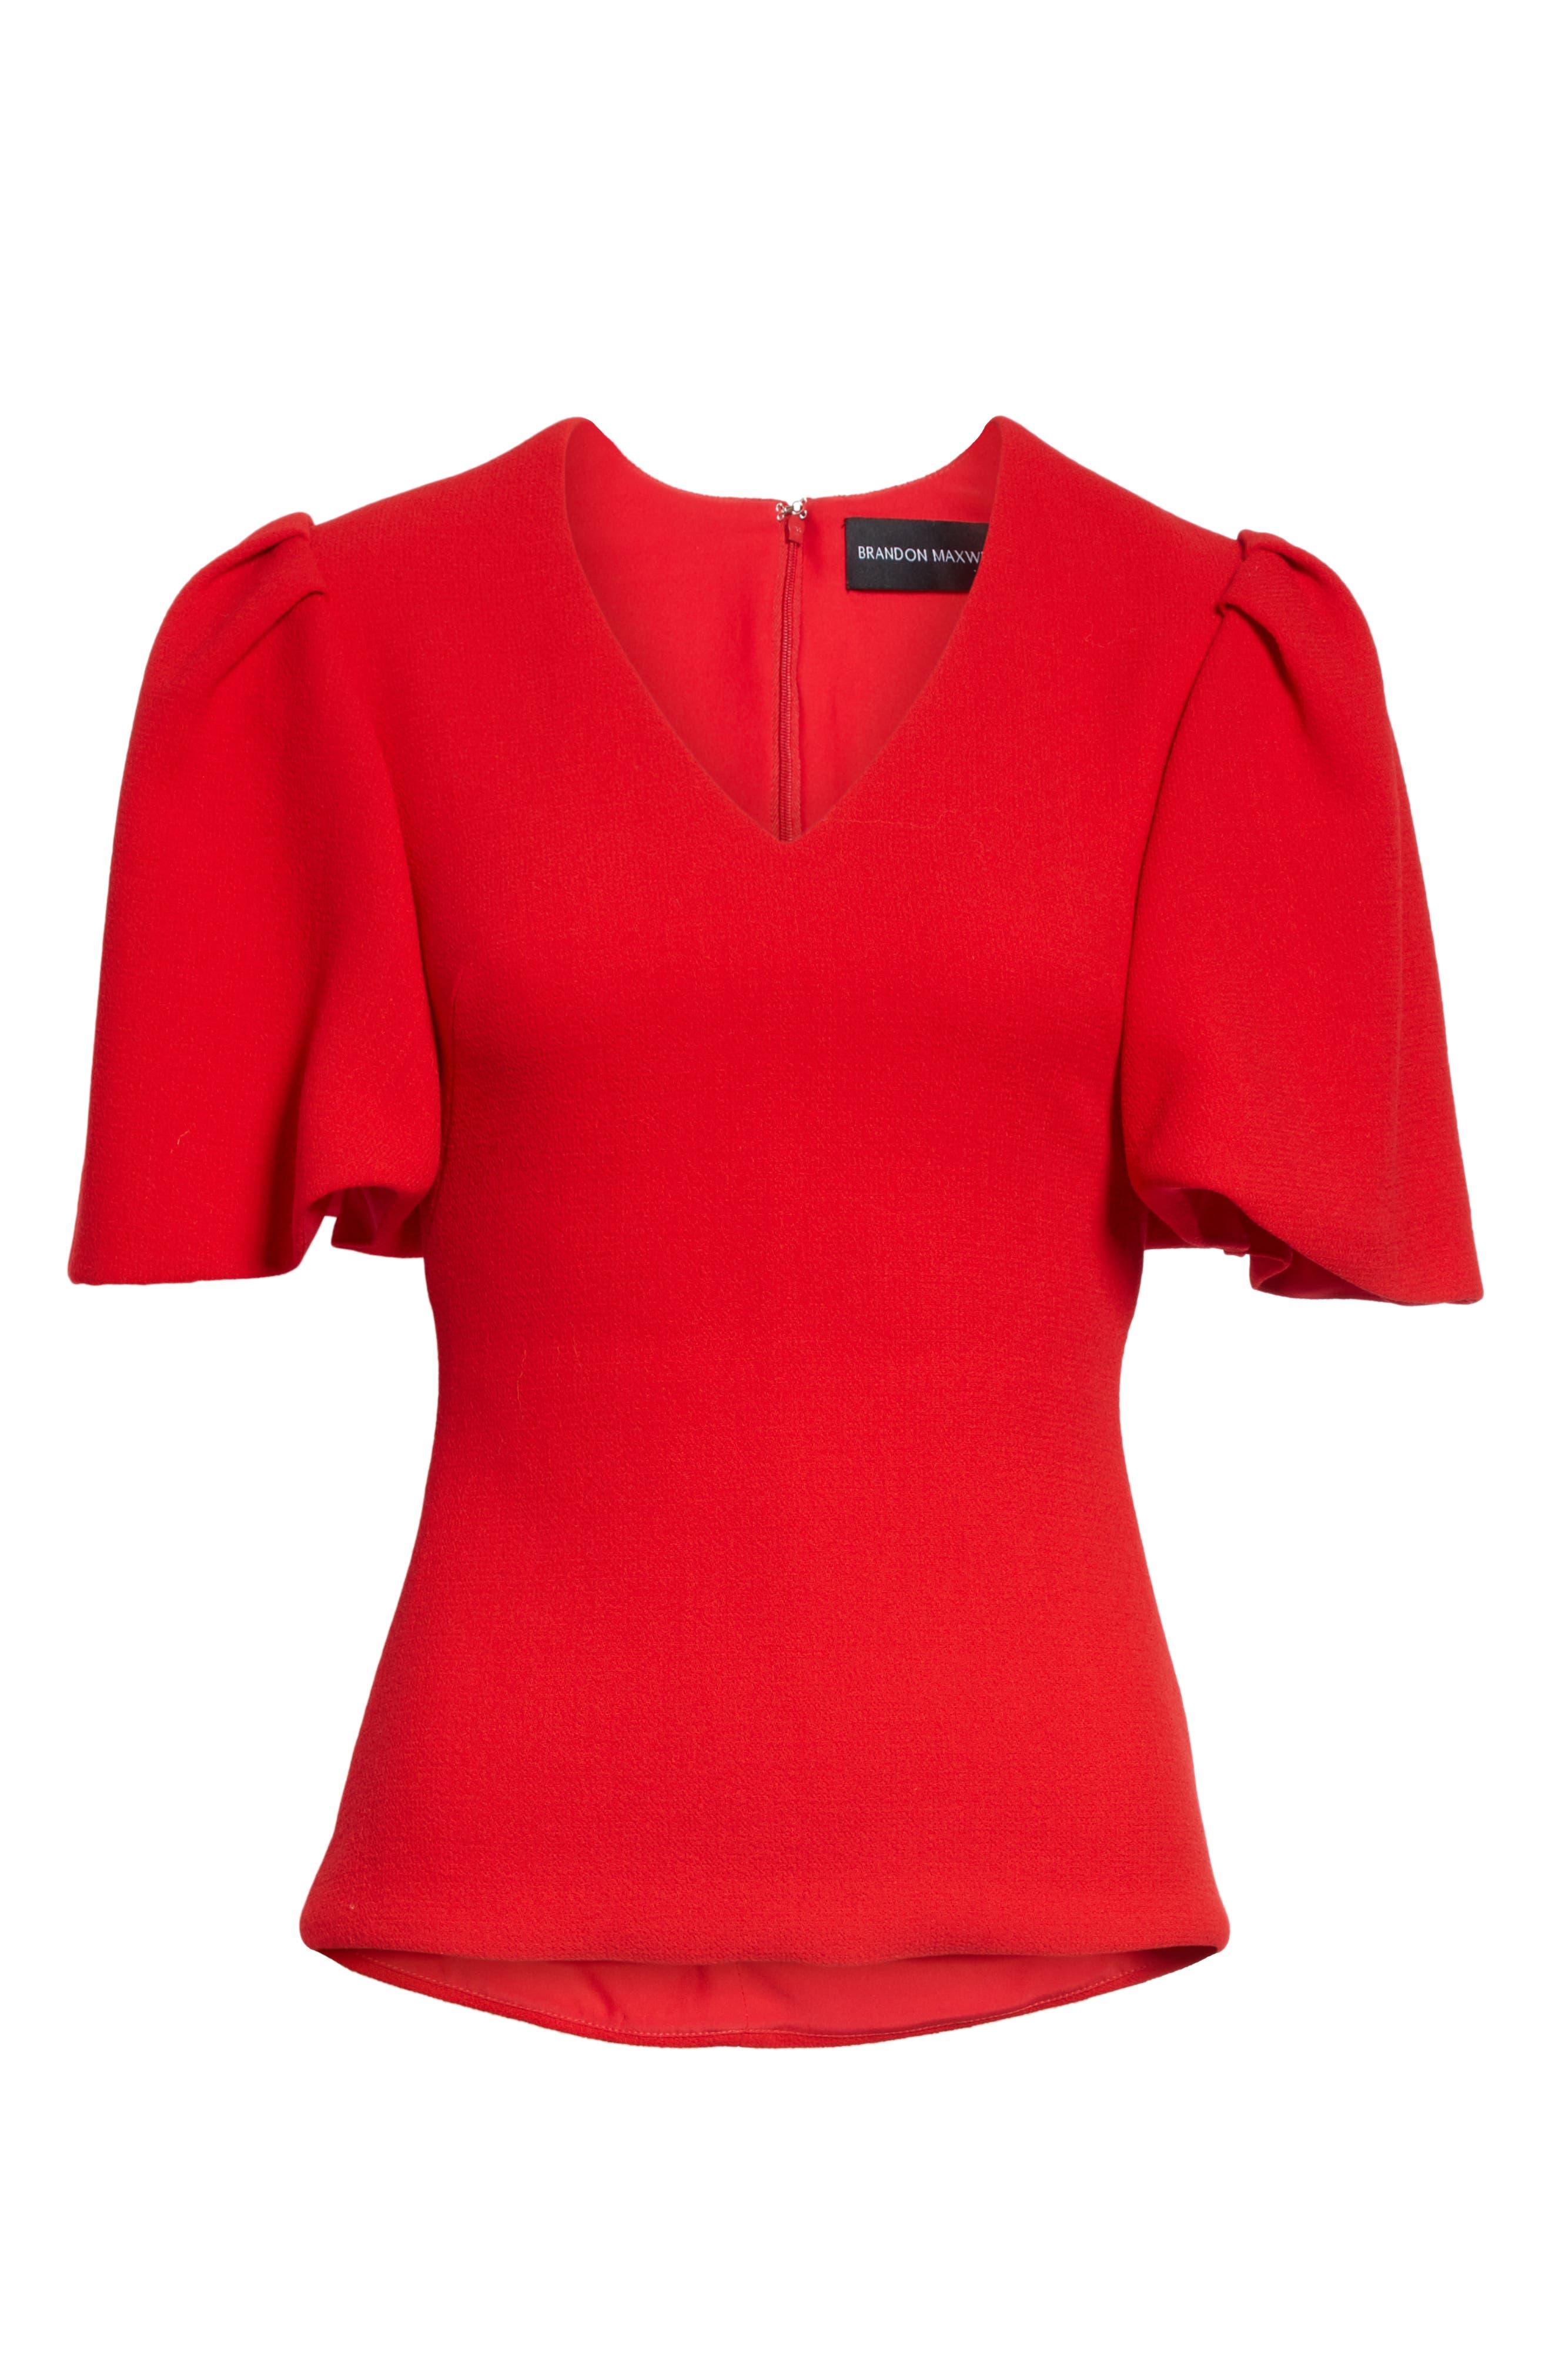 BRANDON MAXWELL, Flutter Sleeve Top, Alternate thumbnail 6, color, RED